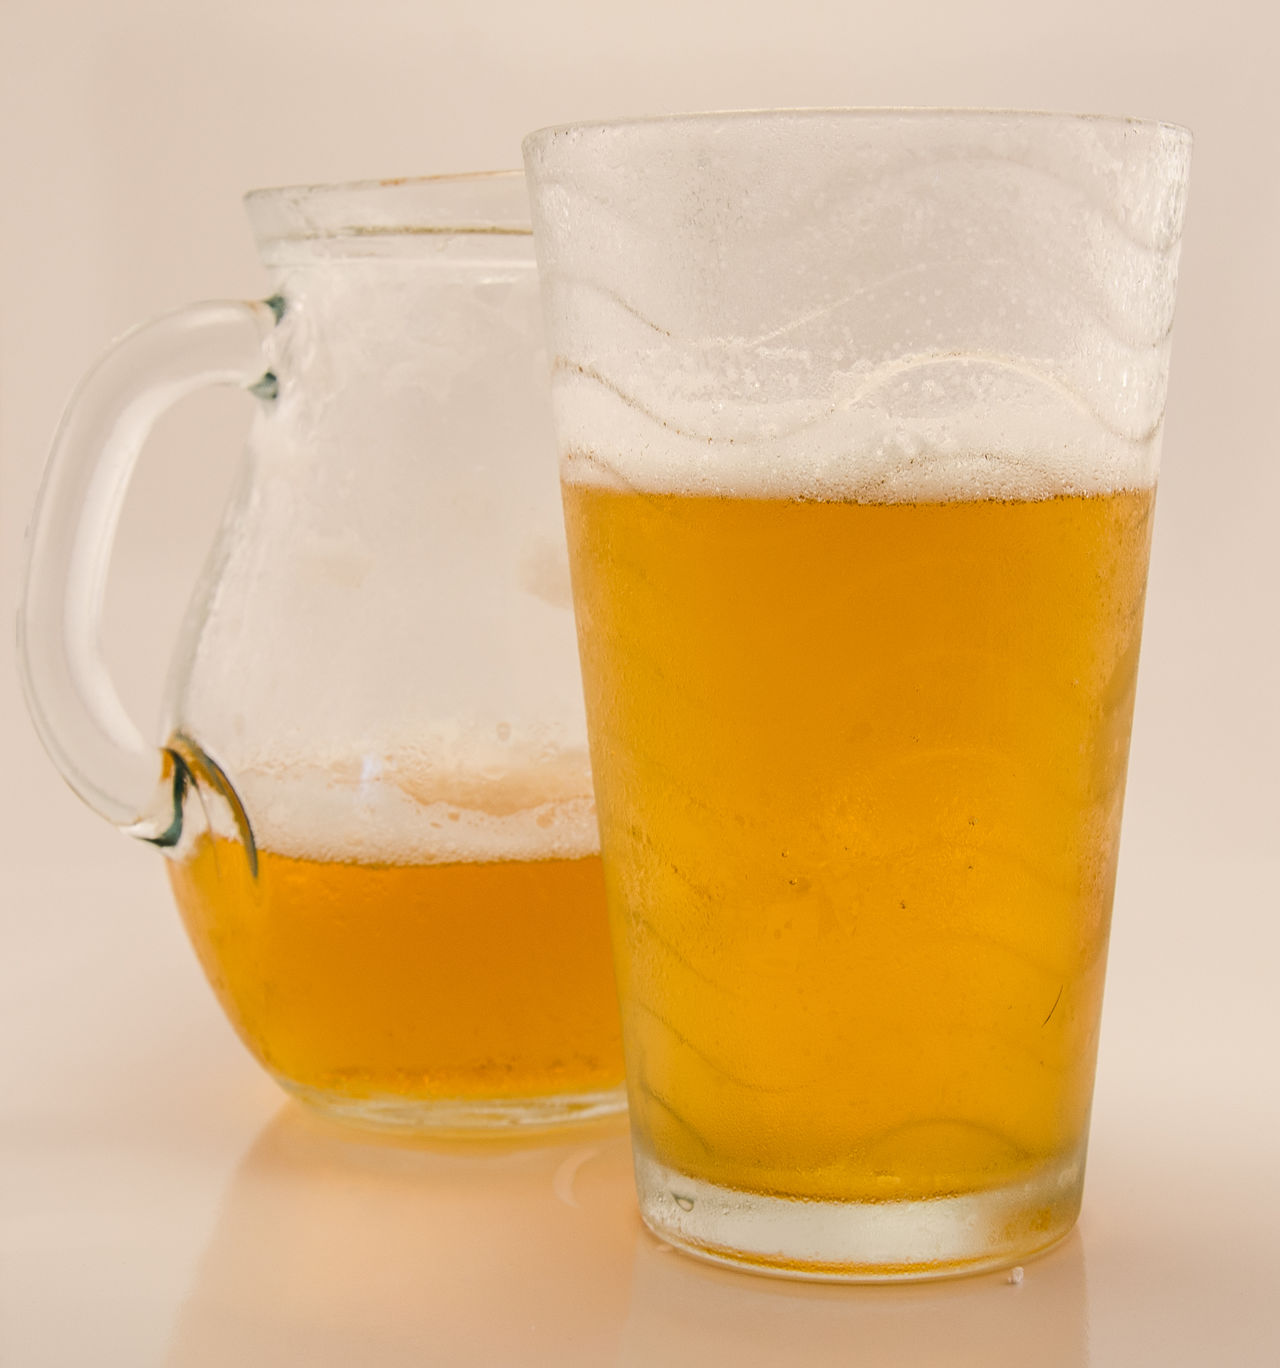 Cerveza rubia Beer Cerveza Cervezaartesanal Drinking Drinking Beer Drinks Fresh Jarra De Cerveza